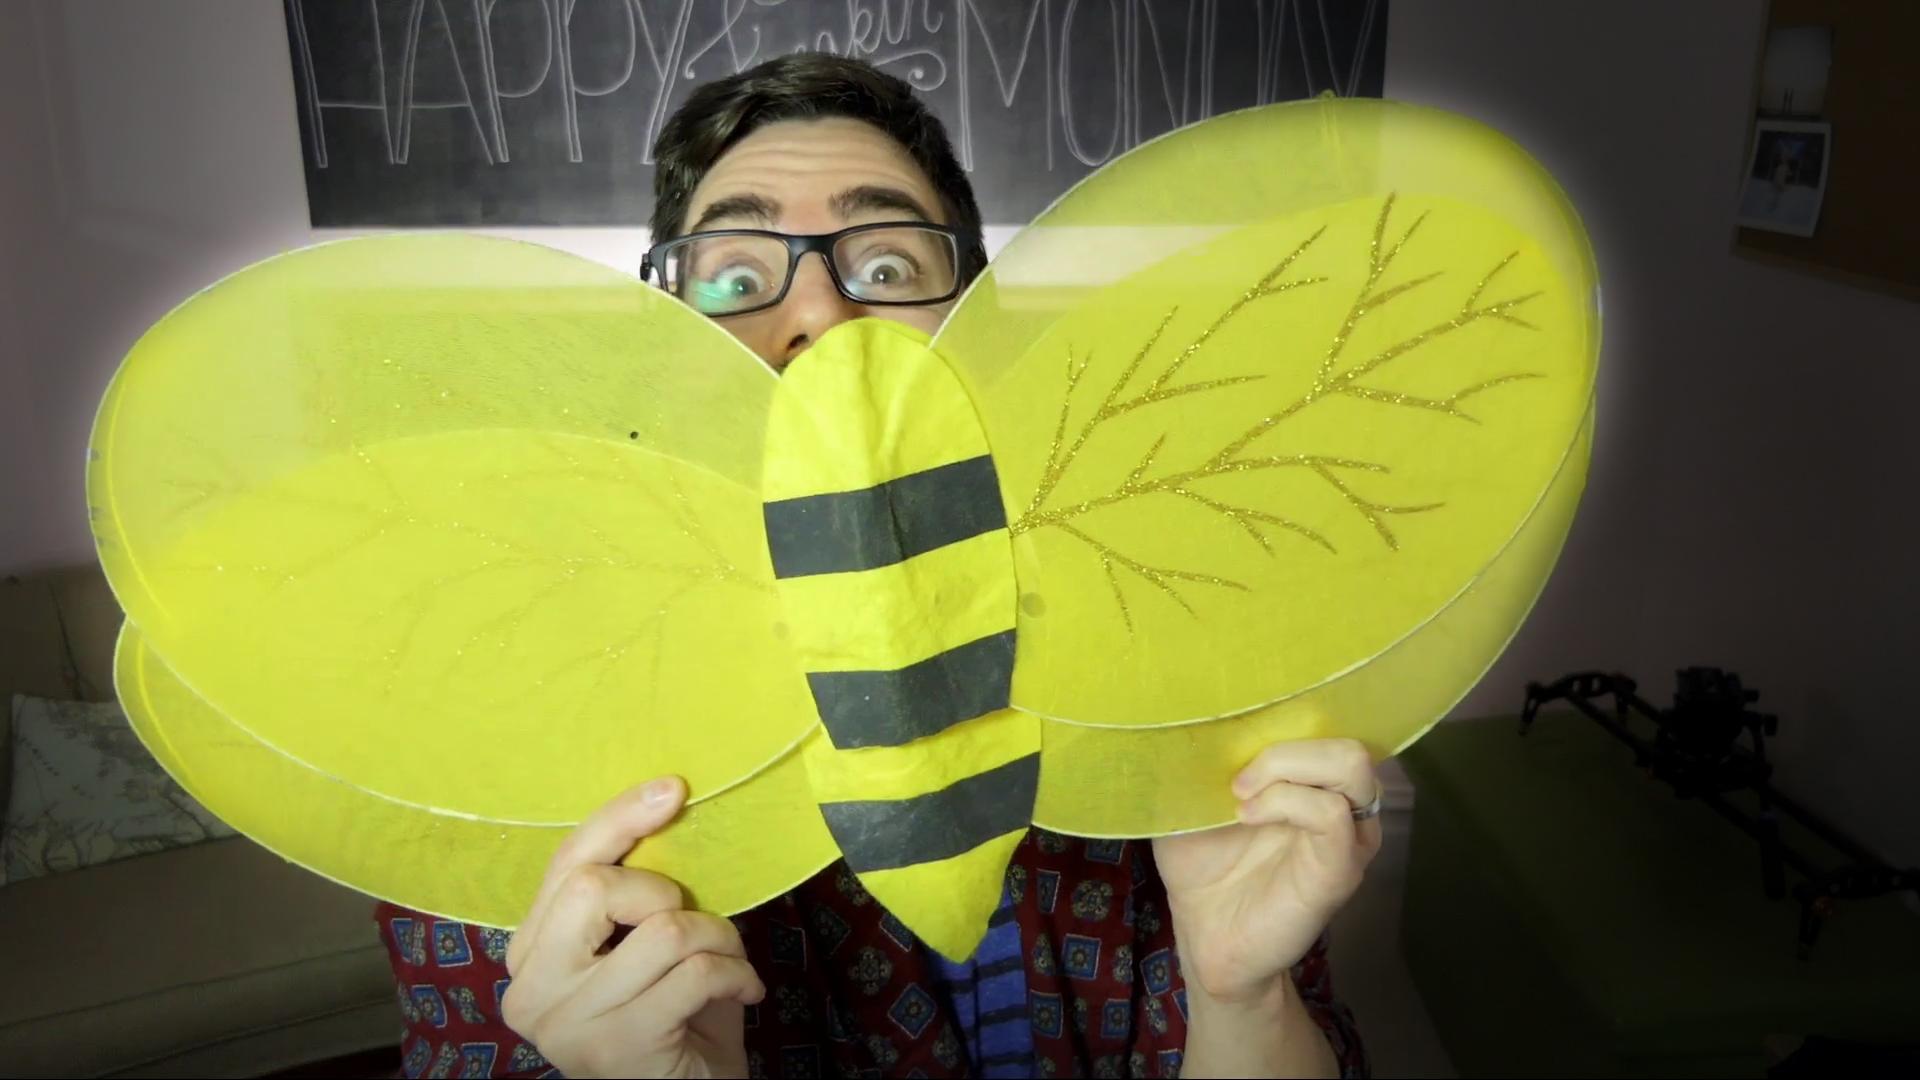 Happy Freakin' Monday Ep 35 – Generating Buzz Pt2